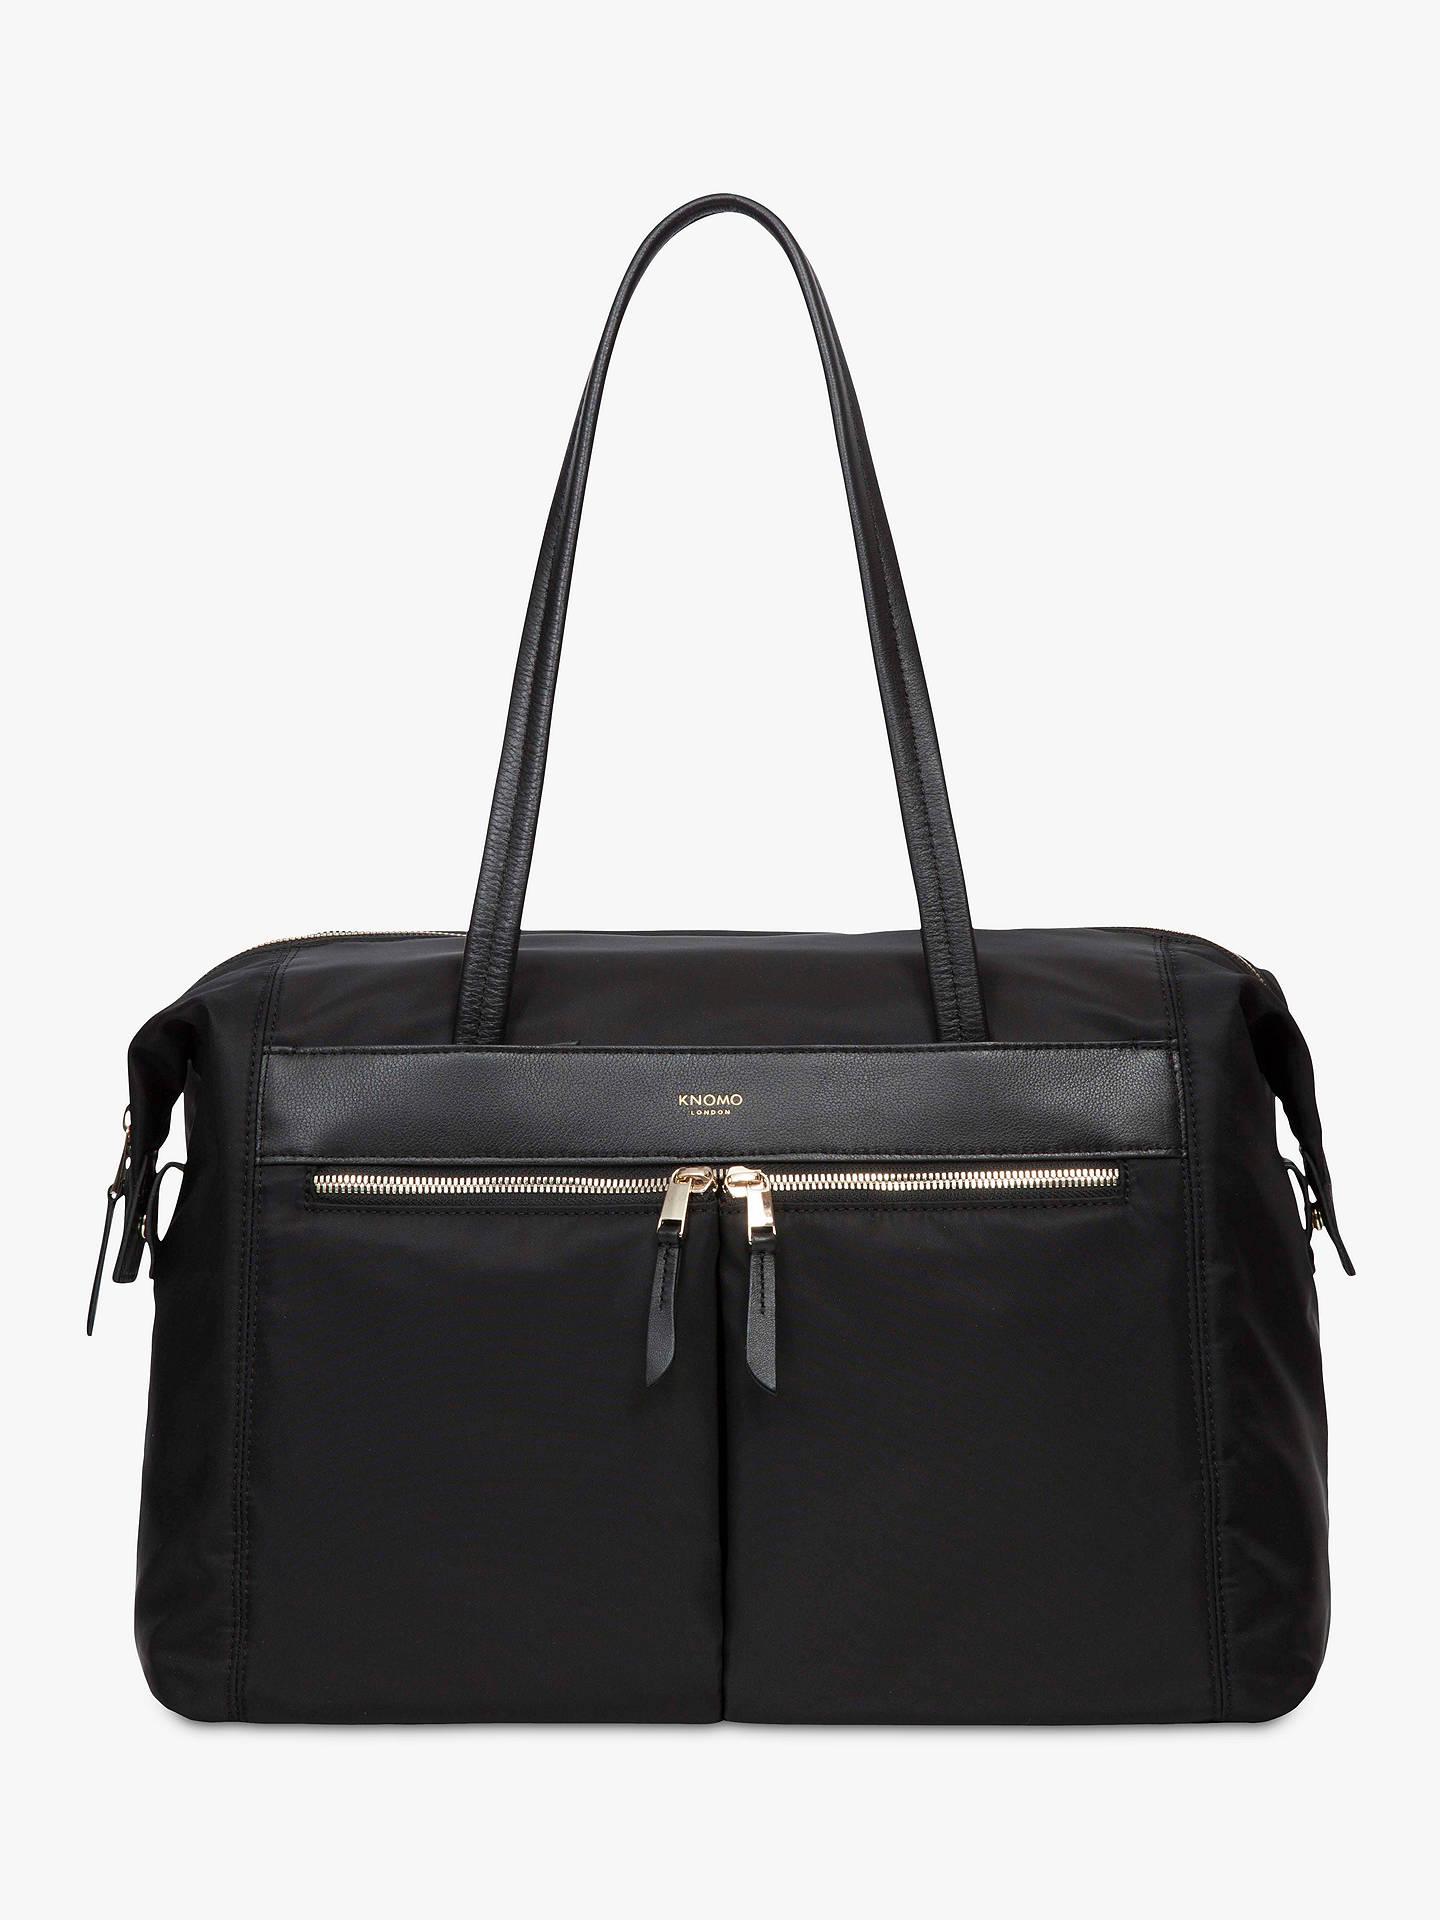 Knomo London Curzon Bag